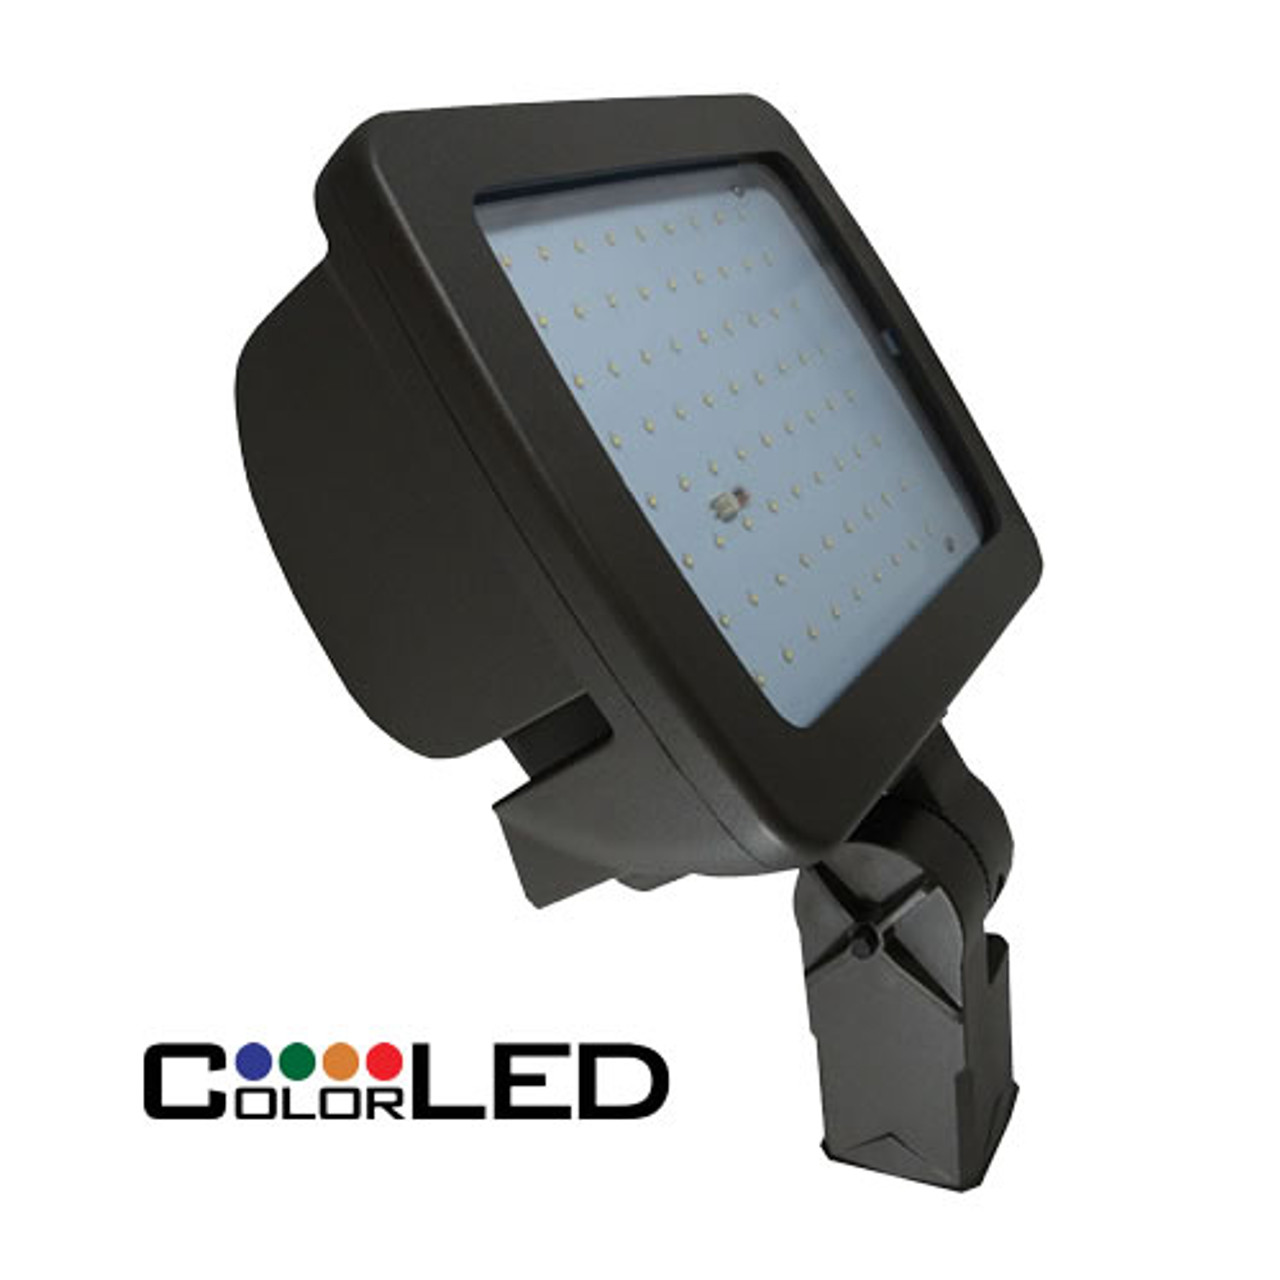 78 Watt Colored LED Area Light